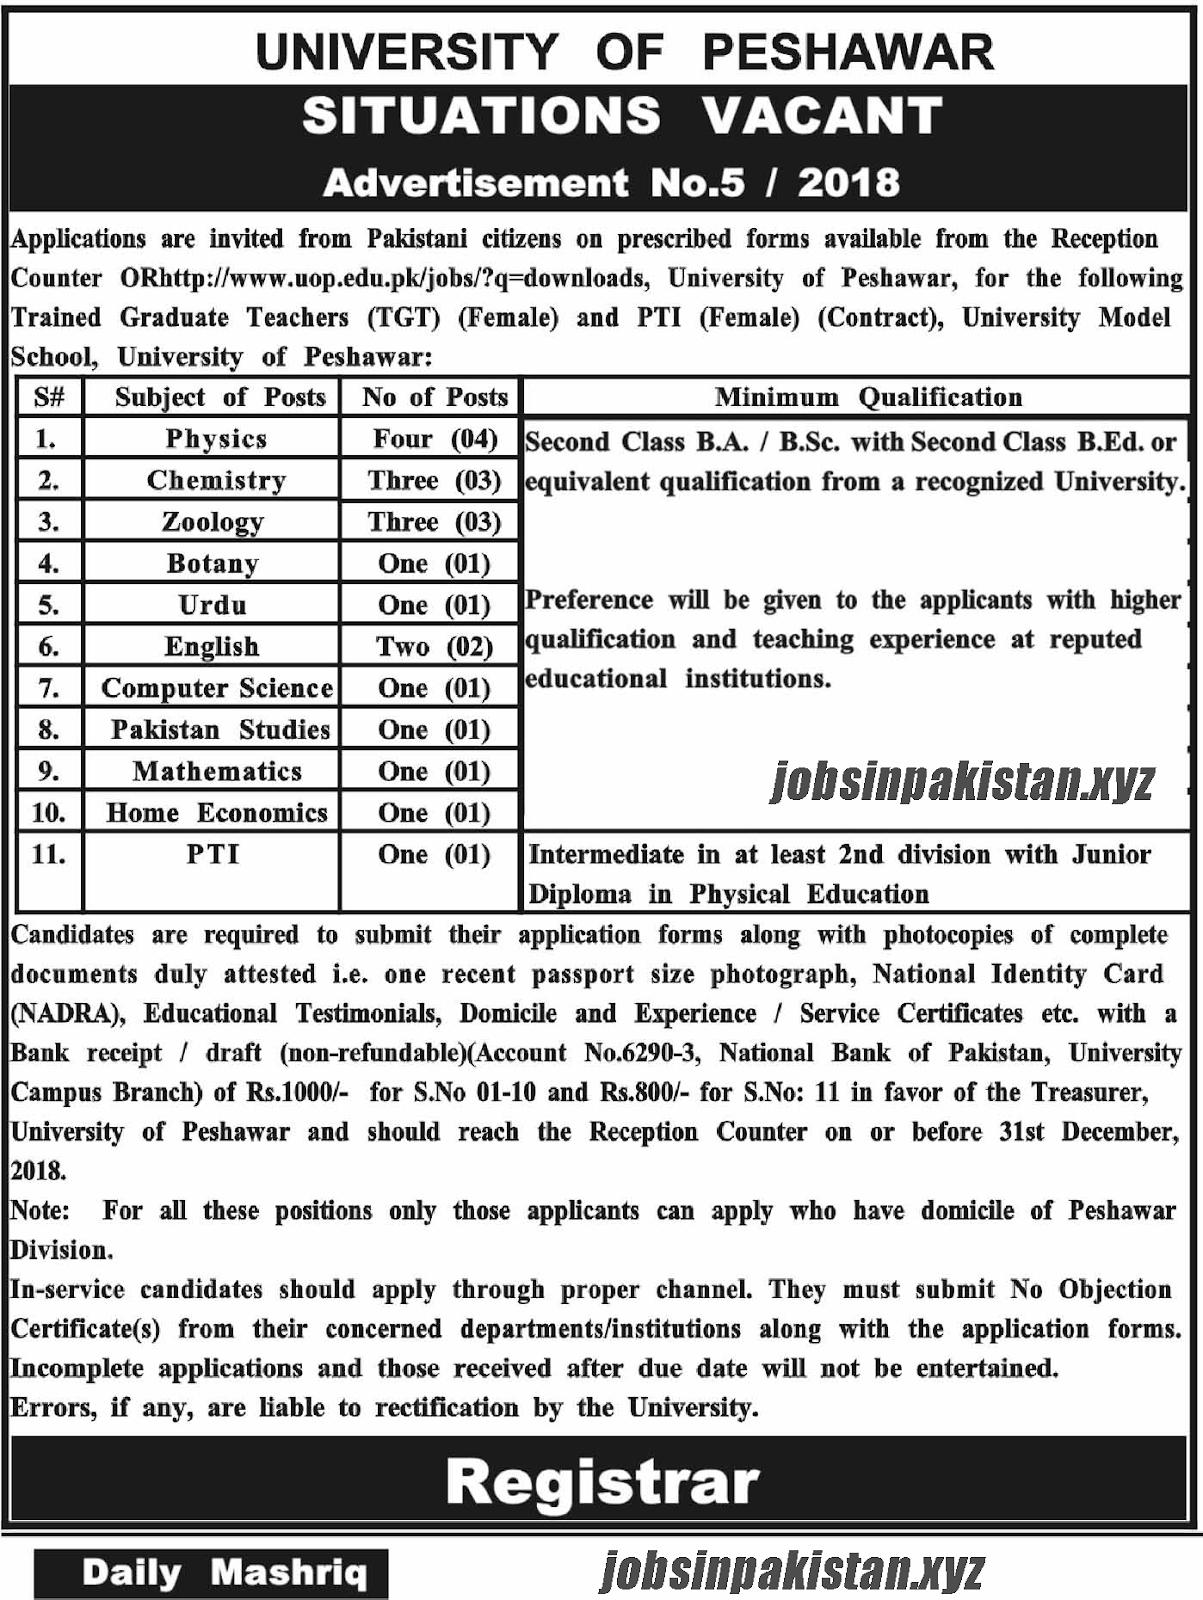 Advertisement for University of Peshawar Jobs December 2018